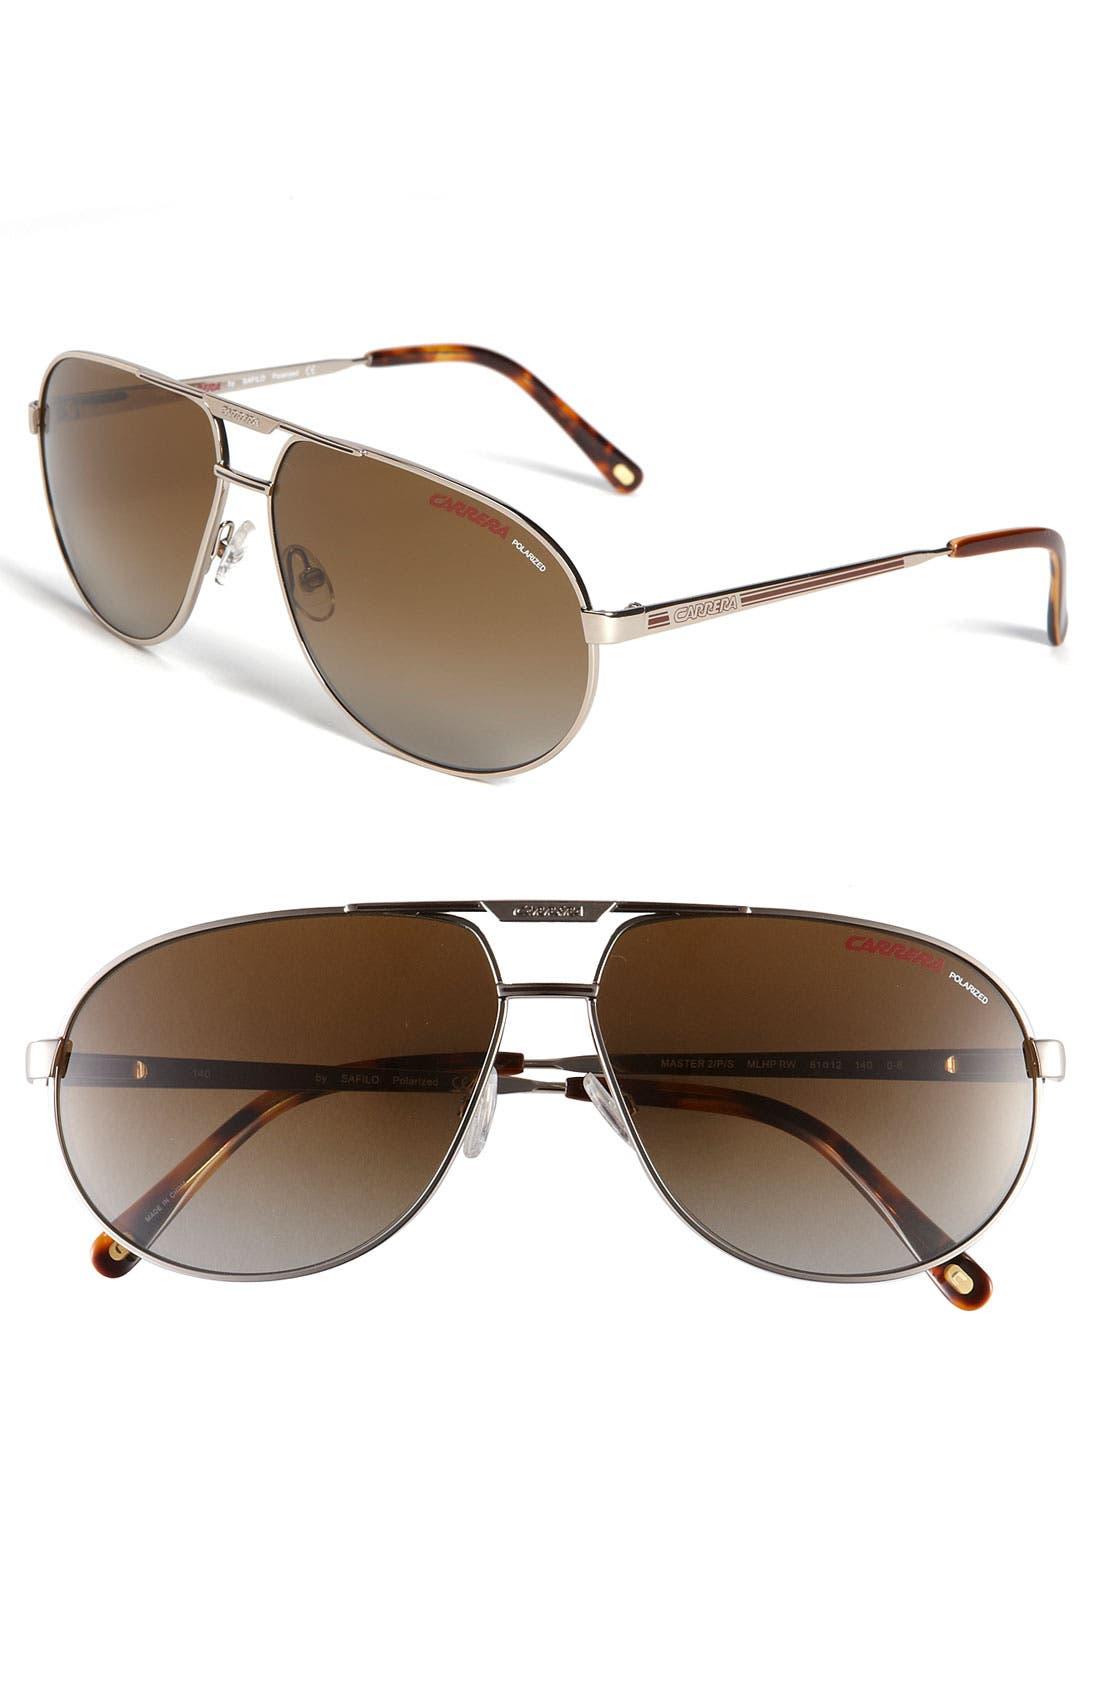 Main Image - Carrera Eyewear 'Master 2' 61mm Polarized Aviator Sunglasses